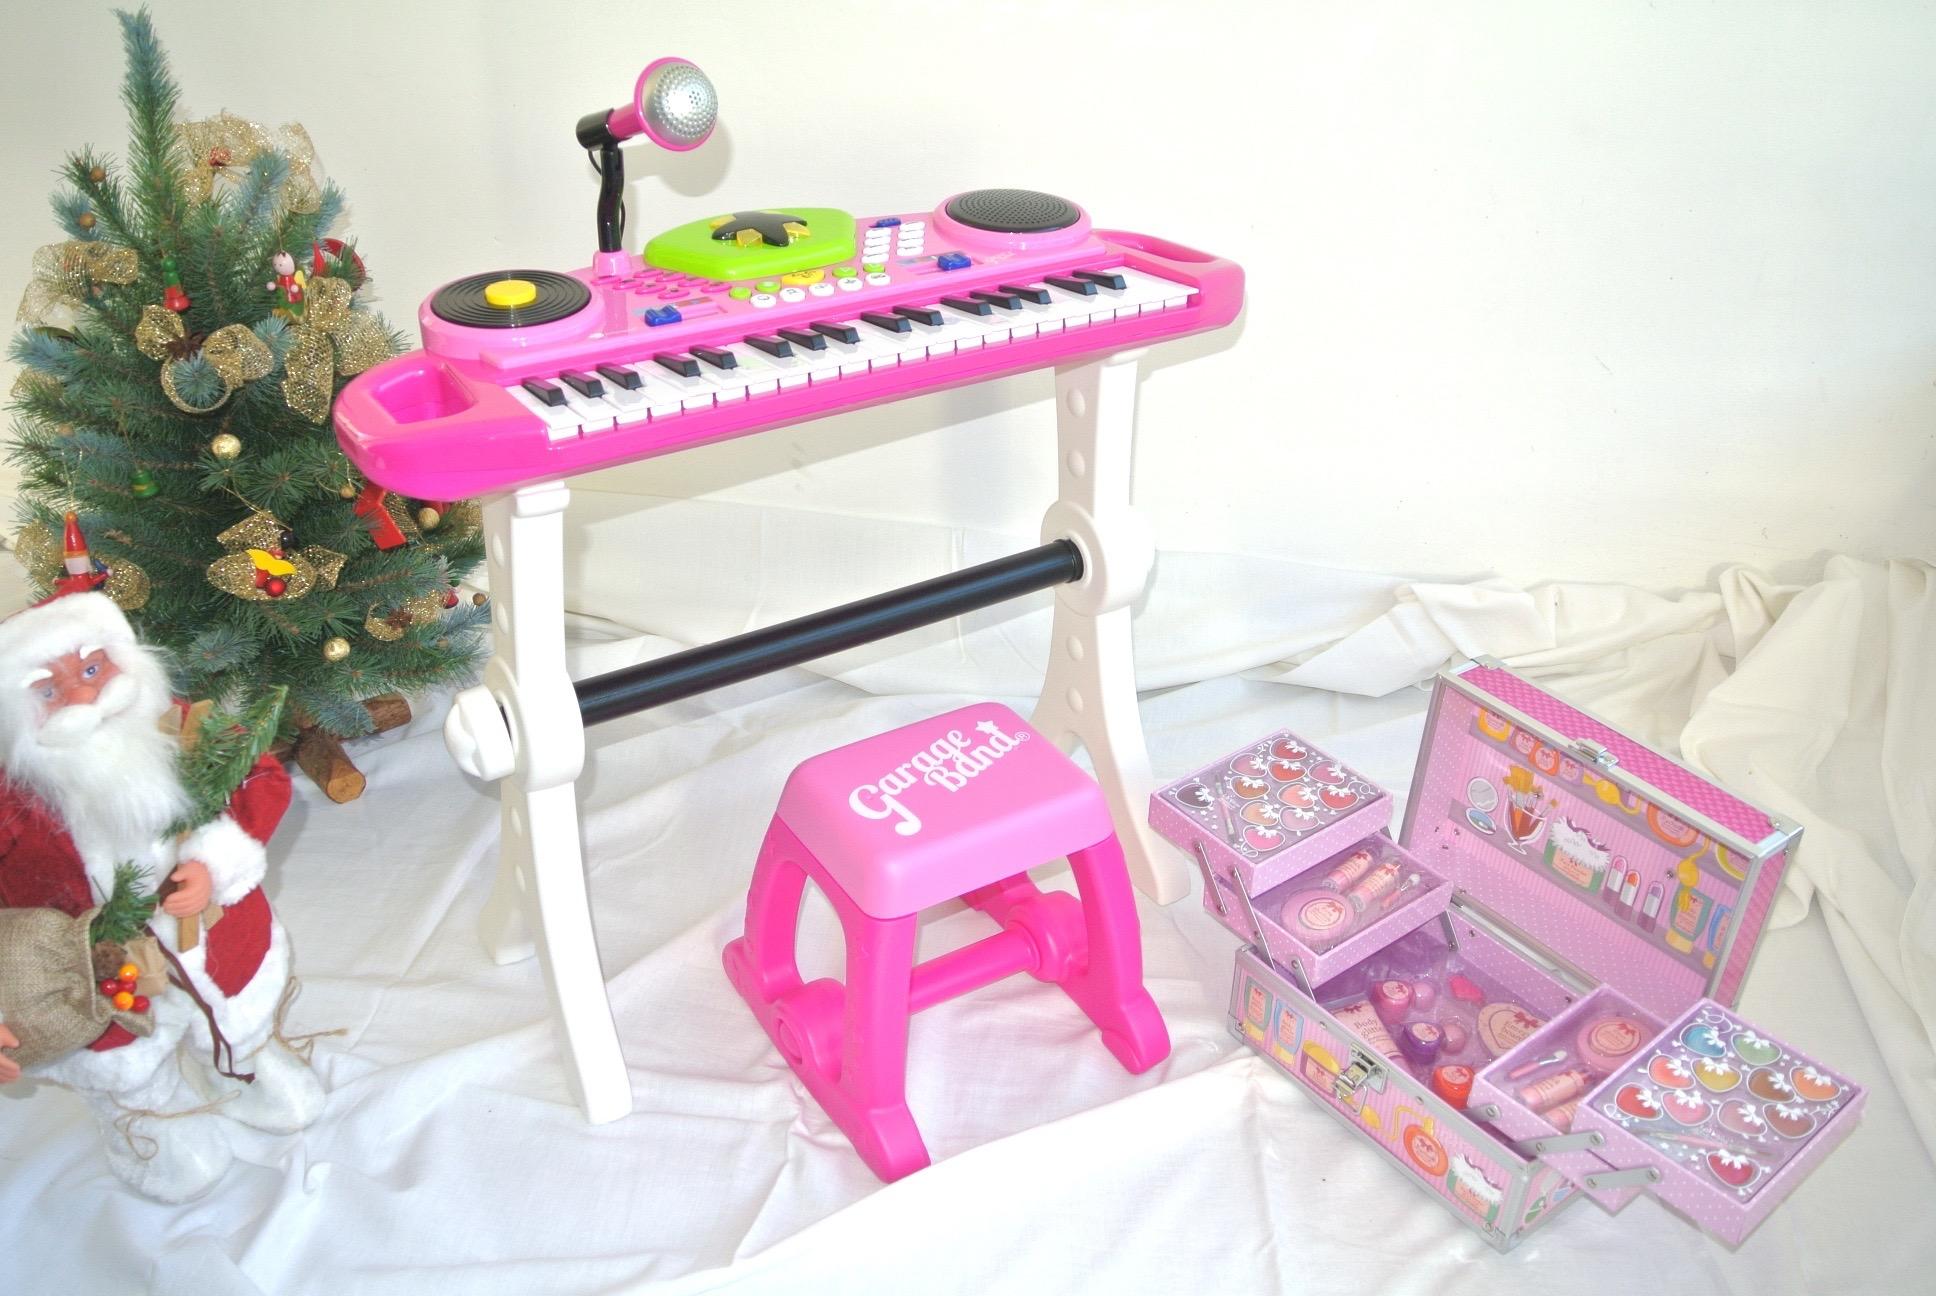 Un Natale in allegria con Imaginarium